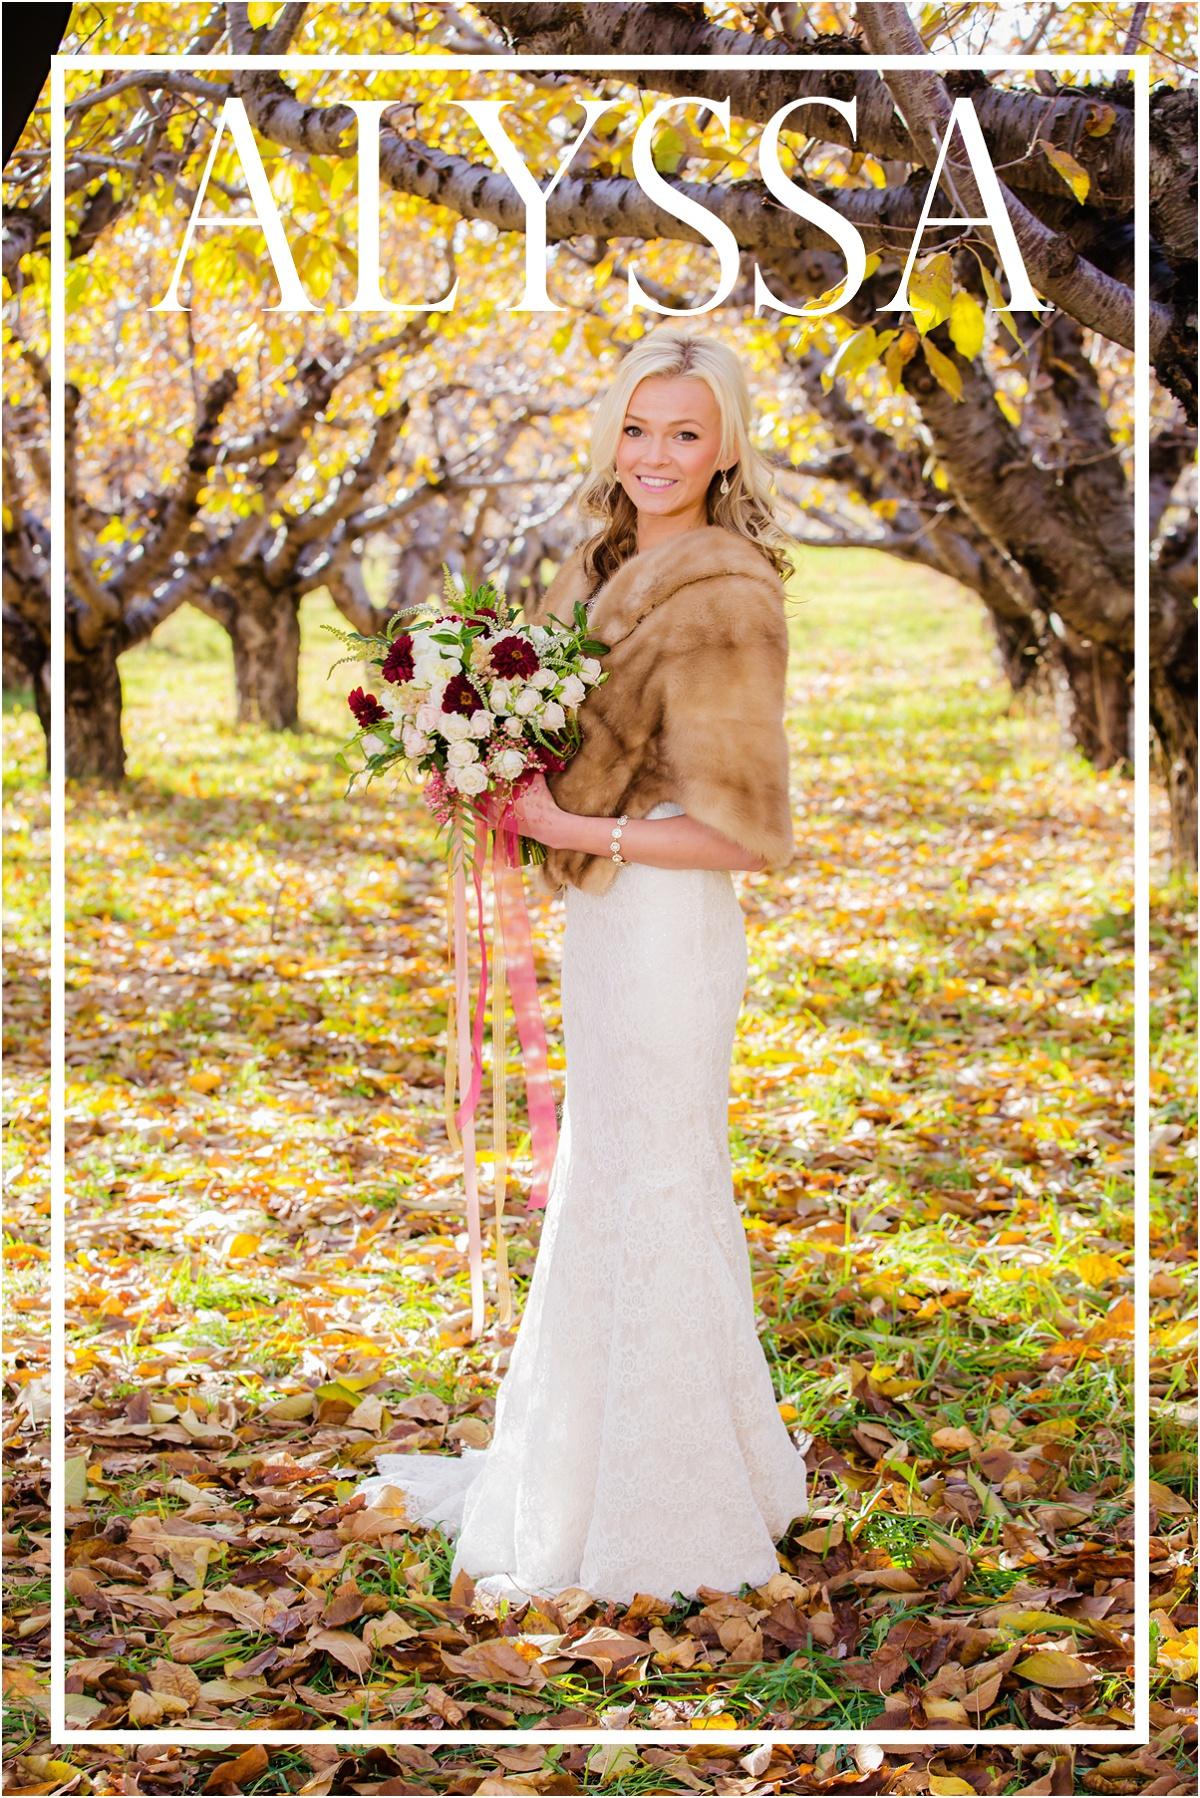 Terra Cooper Photography Weddings Brides 2015_5383.jpg